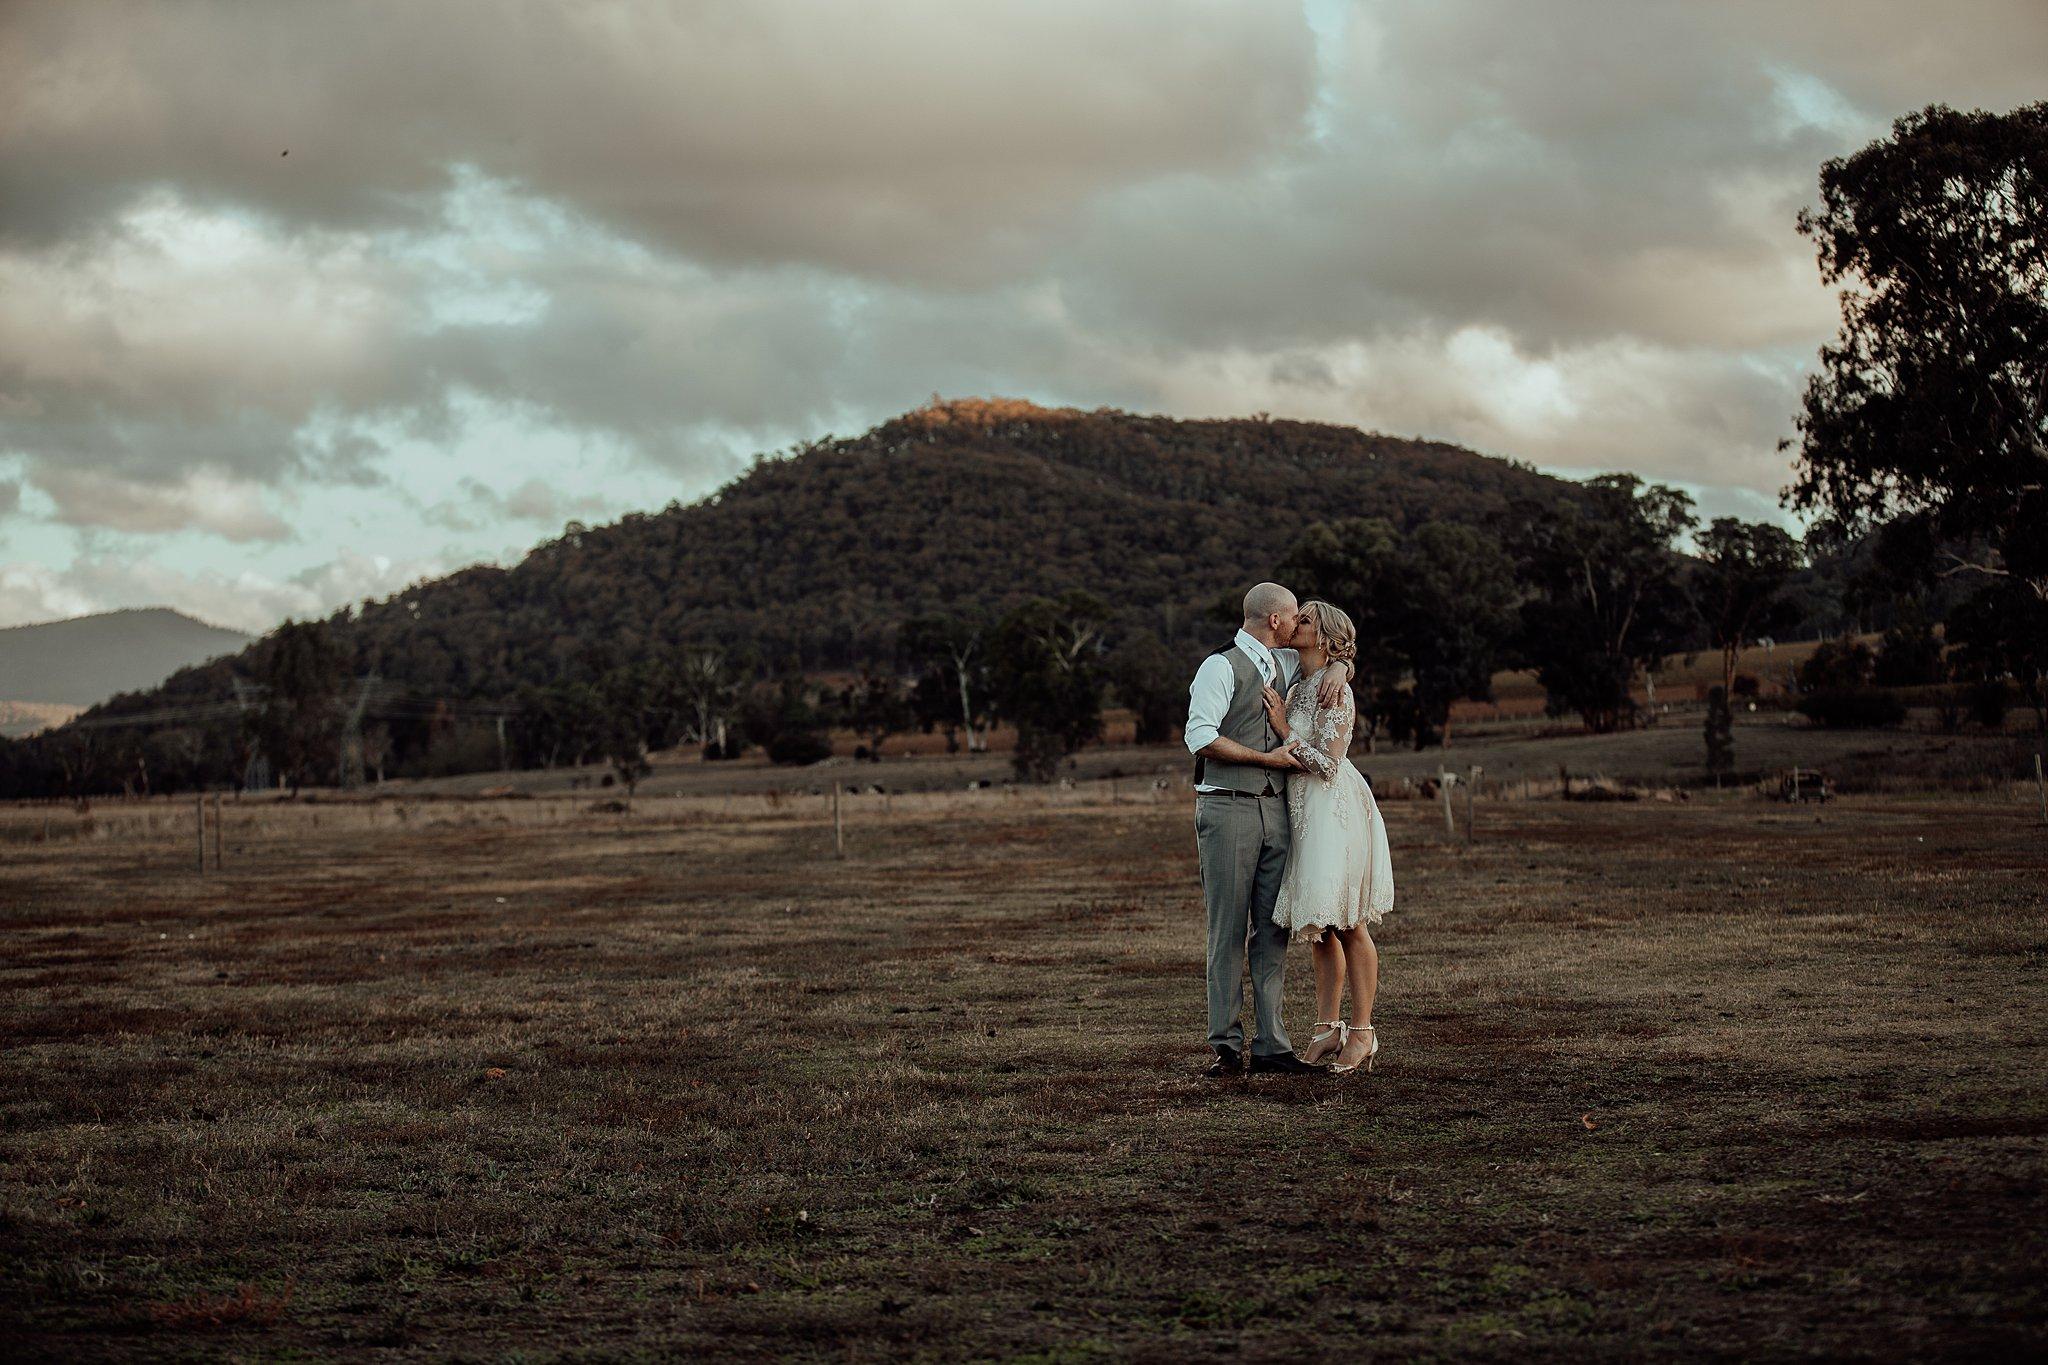 mickalathomas_puremacphotography_weddingphotographer_couplephotographer_Sheppartonphotographer_3476.jpg